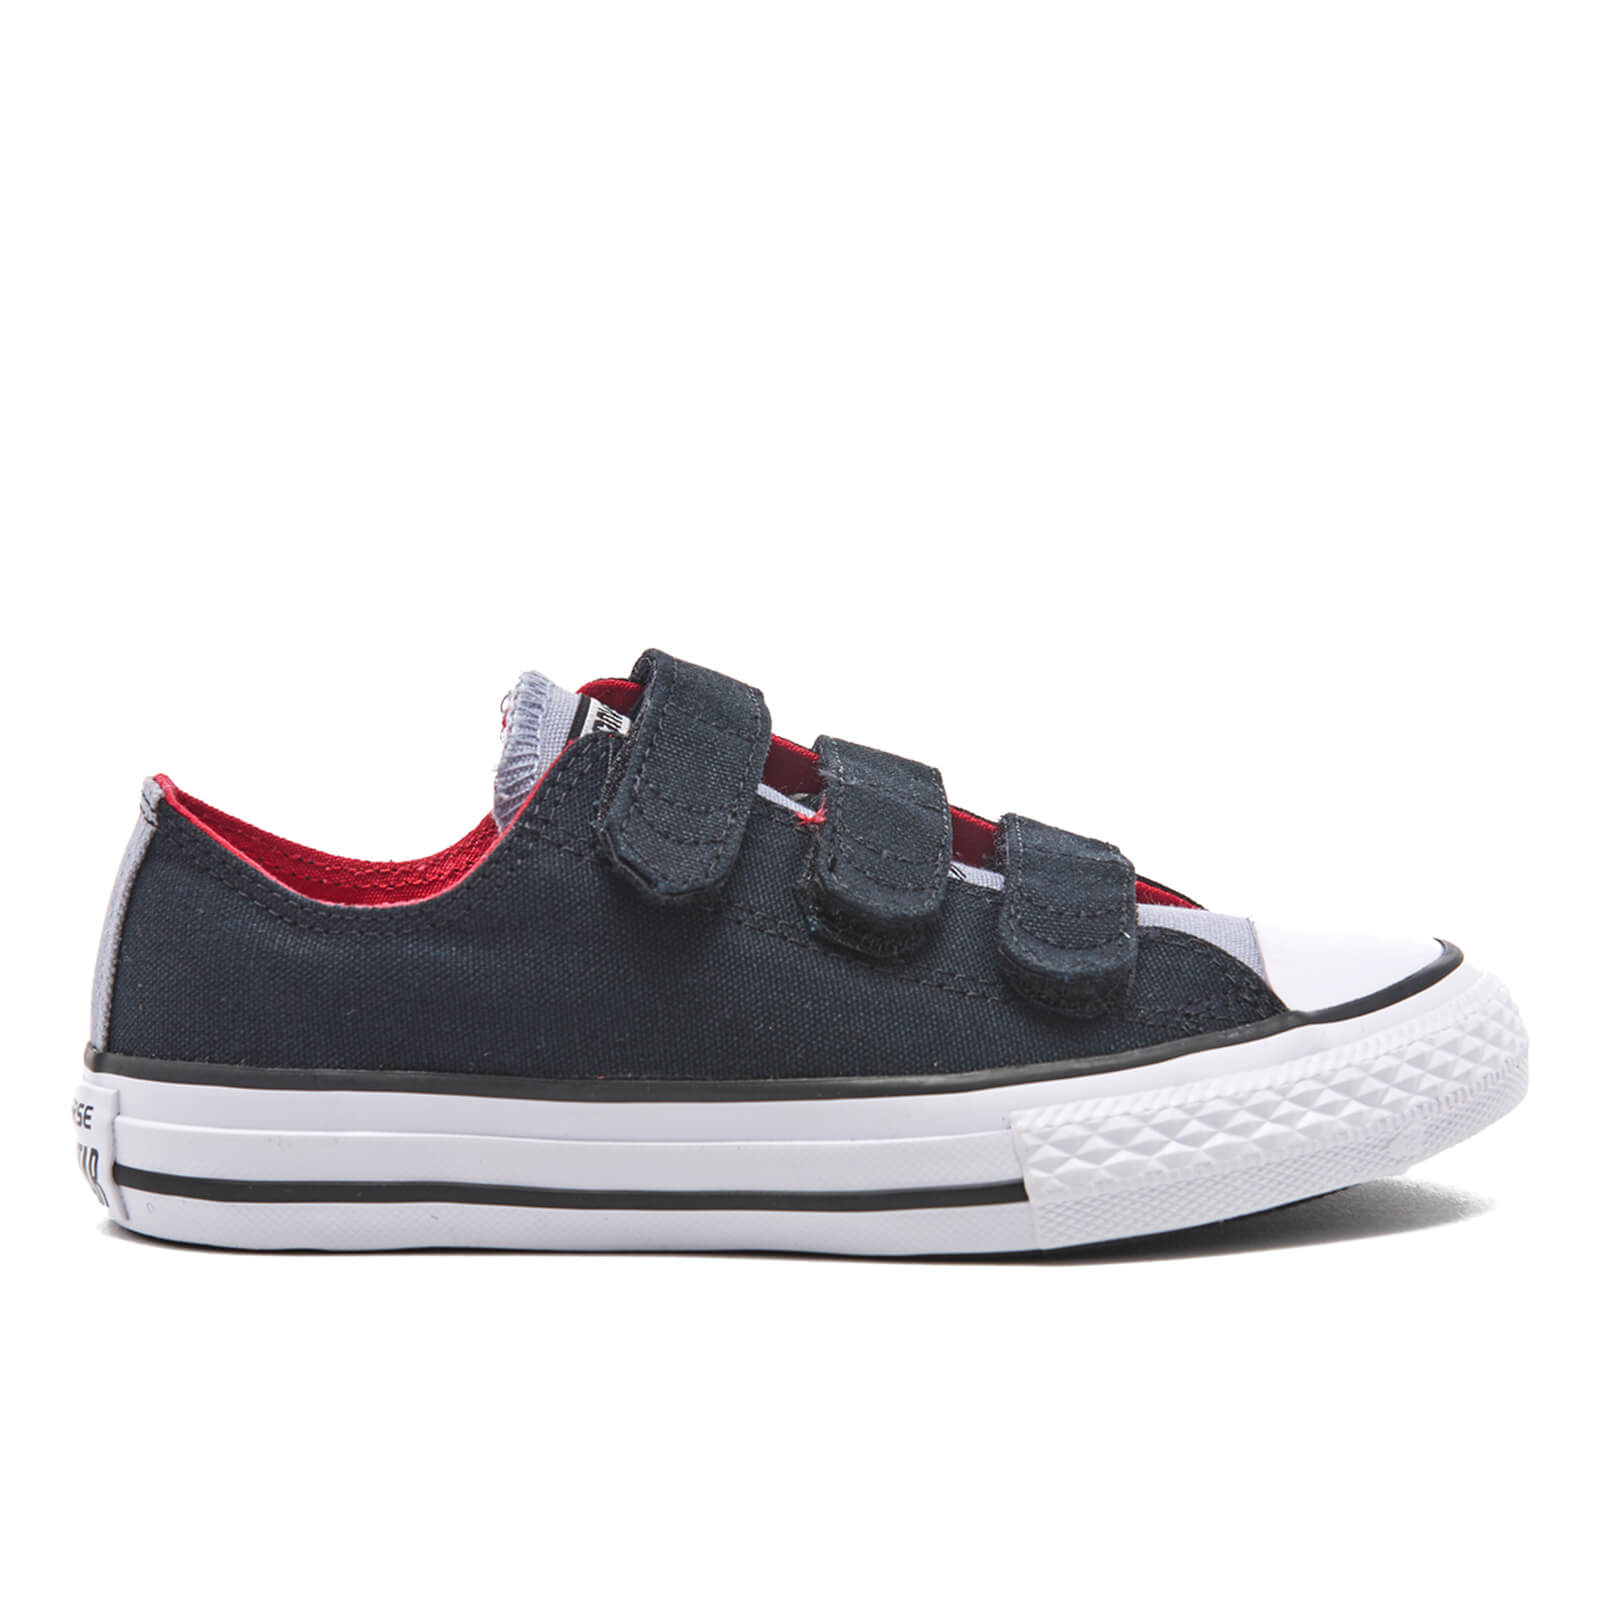 a00e026695fe Converse Kids  Chuck Taylor All Star II 3V Ox Trainers - Black Blue  Granite White Junior Clothing